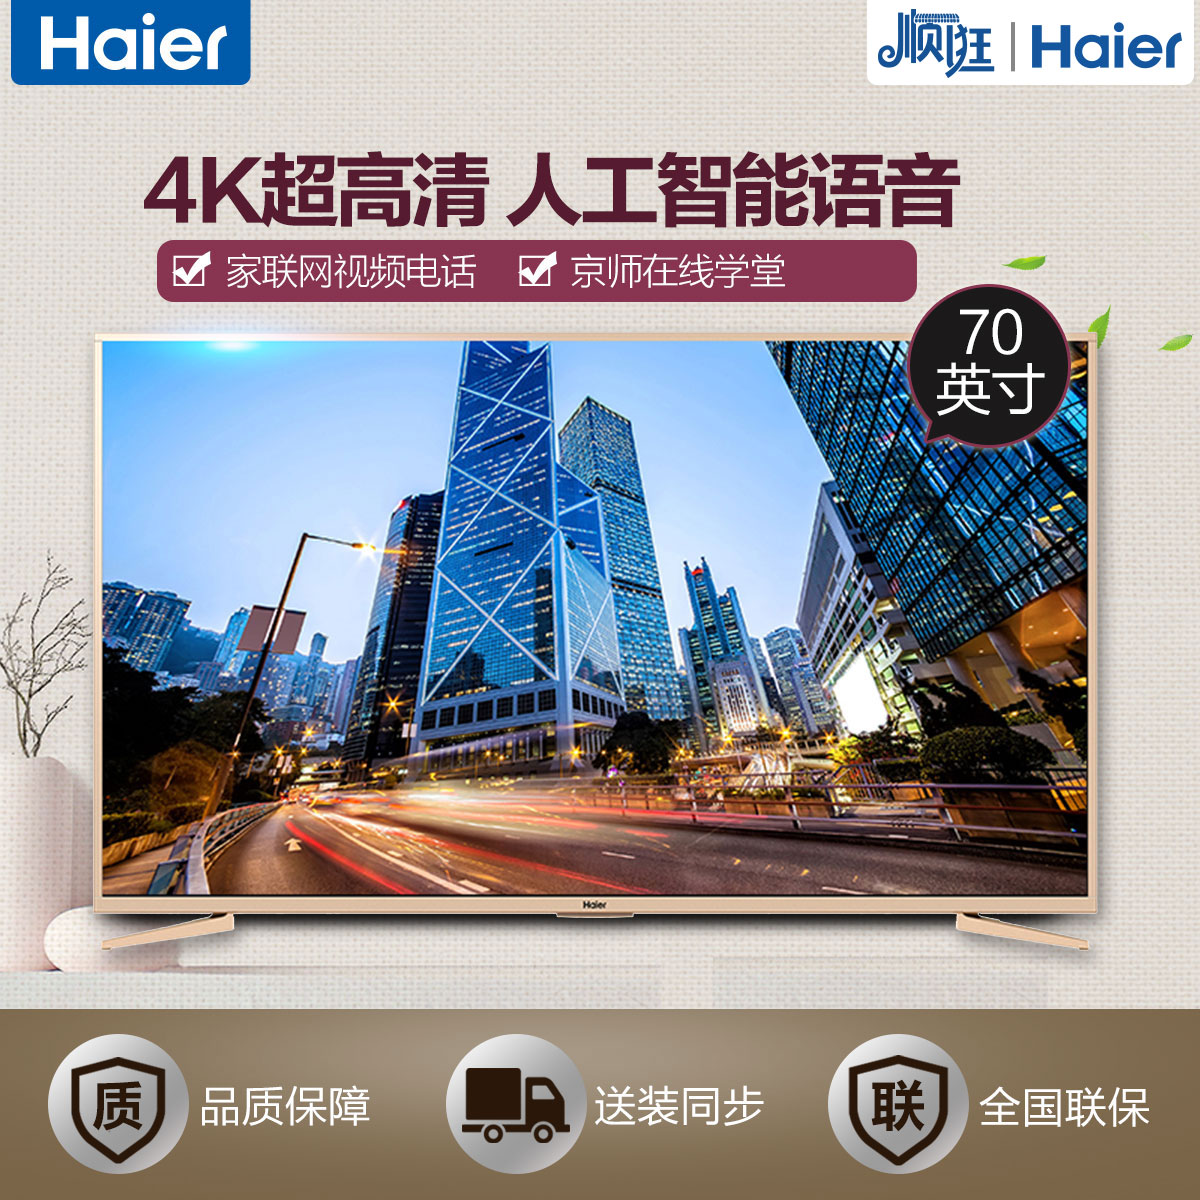 Haier/海尔             4K电视             LS70AL88U62